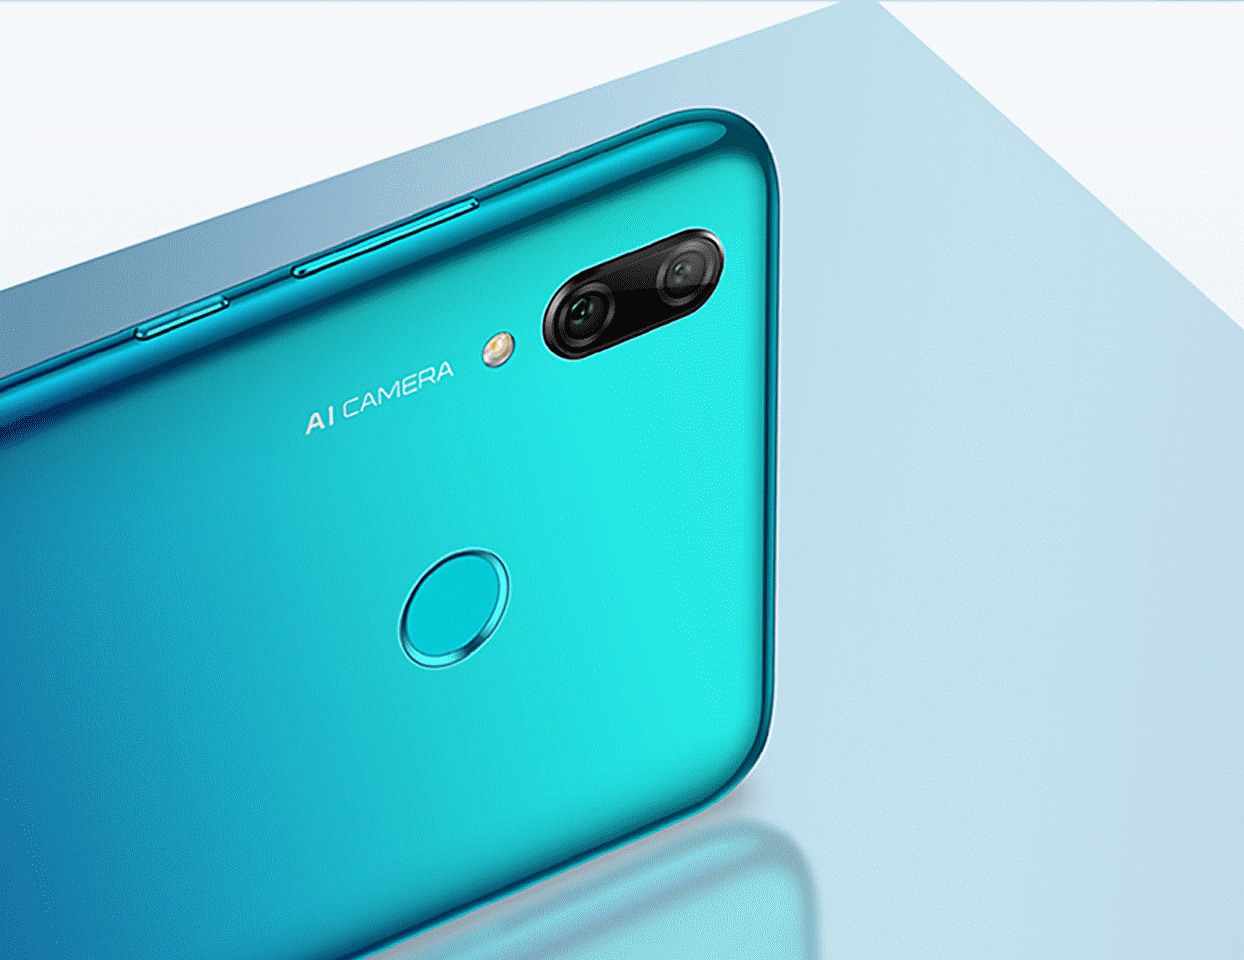 Huawei P Smart 2019 Deals - Contract, Upgrade, Sim Free